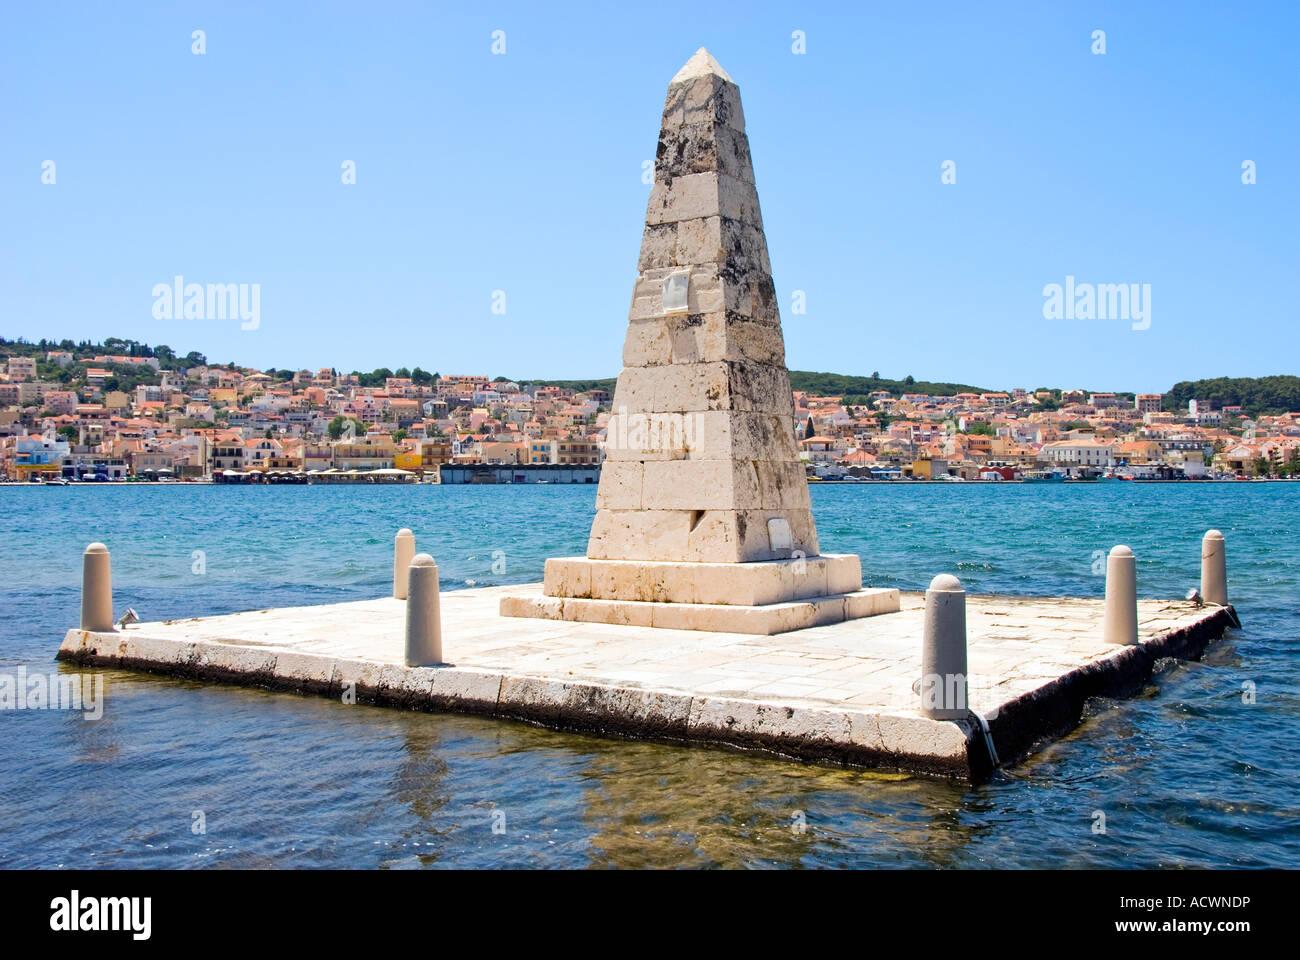 The Drapano Bridge Monument, Argostoli, Kefalonia Greece. - Stock Image